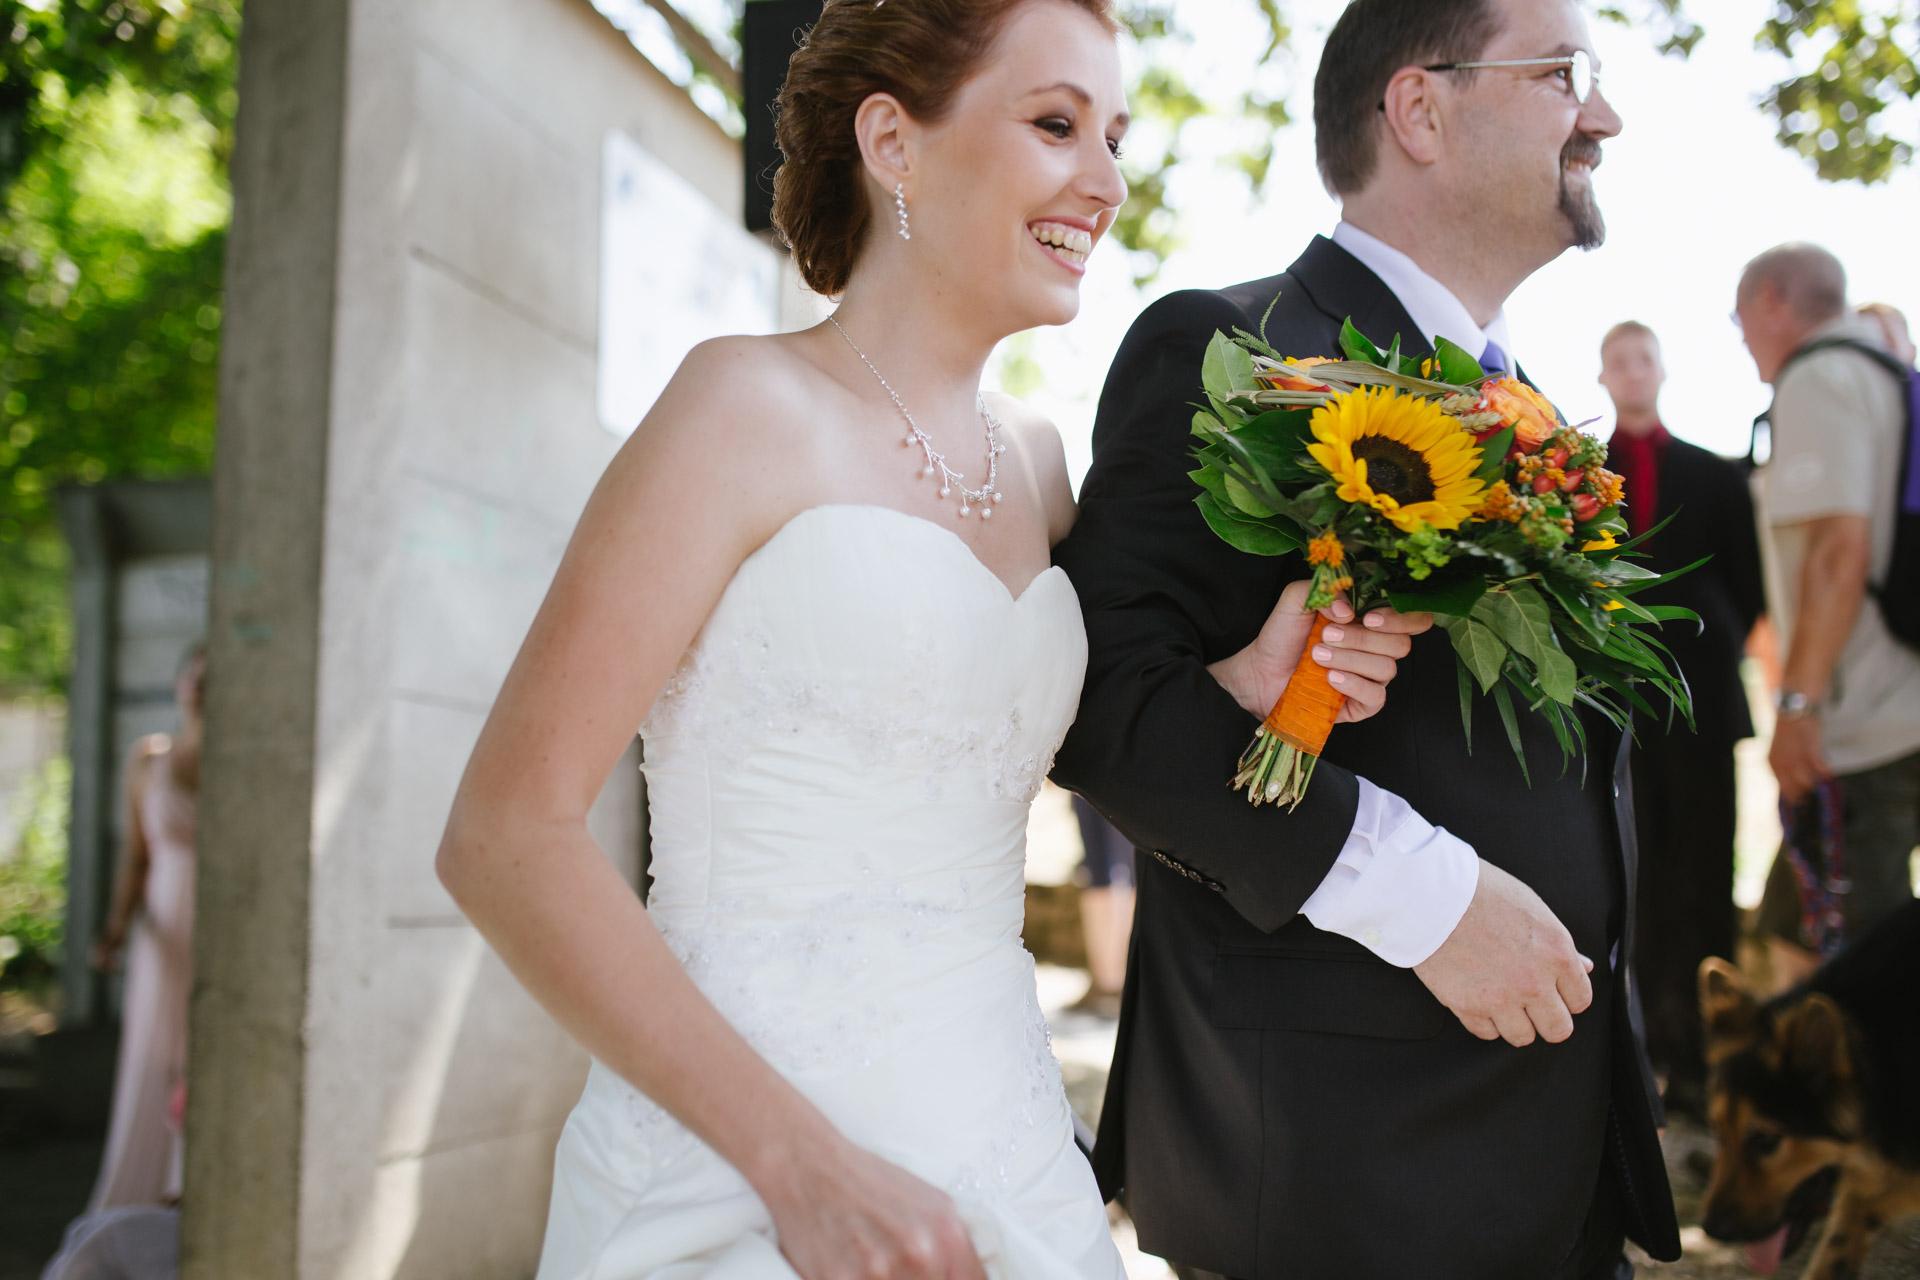 Pixelart_Hochzeitsfotografen_Loerrach_Rheinfelden_Hallwil_Schweiz_Linda-Ramon-1022